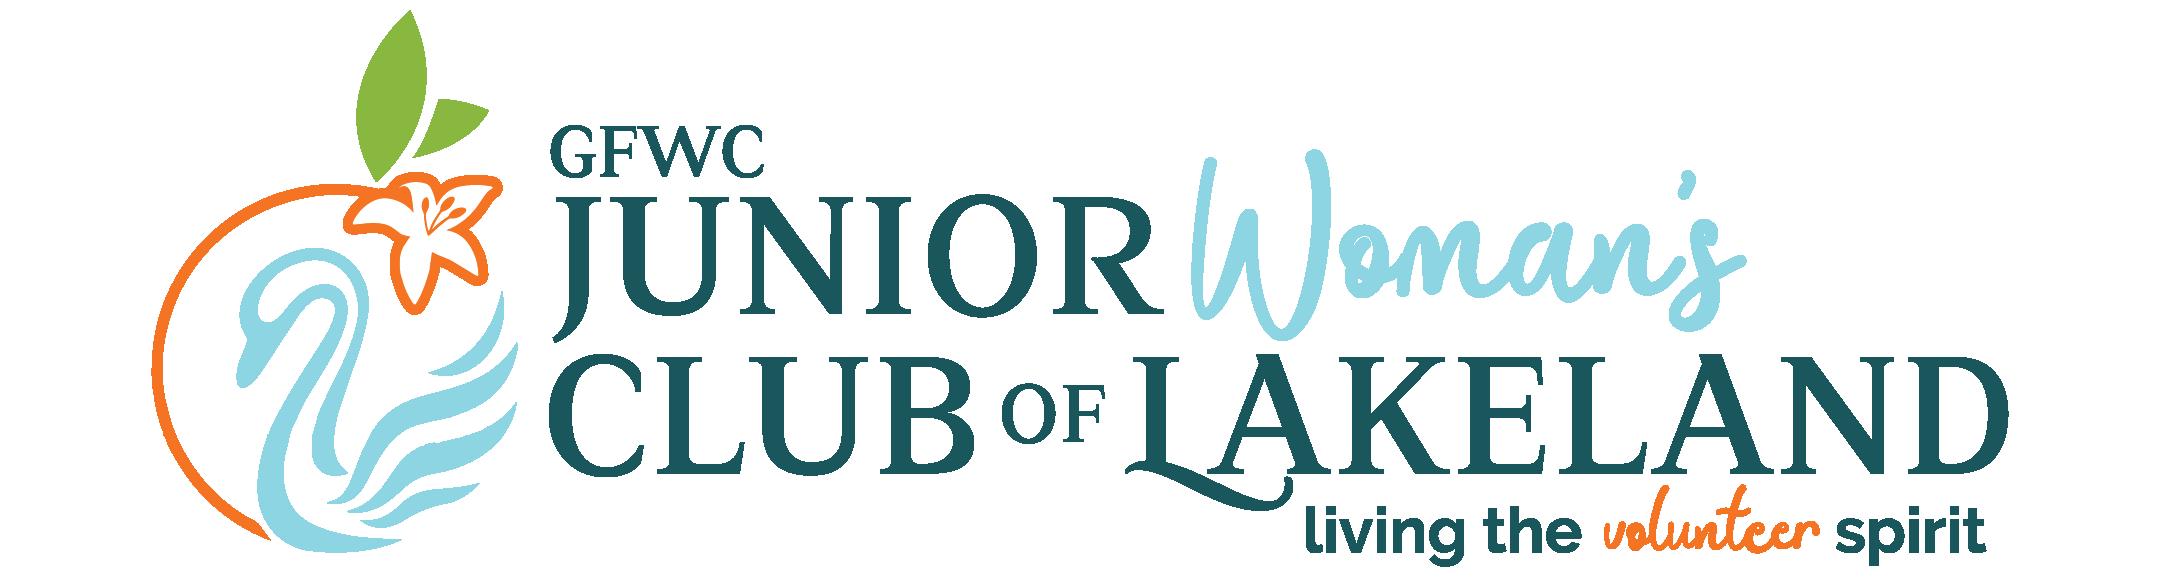 GFWC Junior Woman's Club of Lakeland Logo